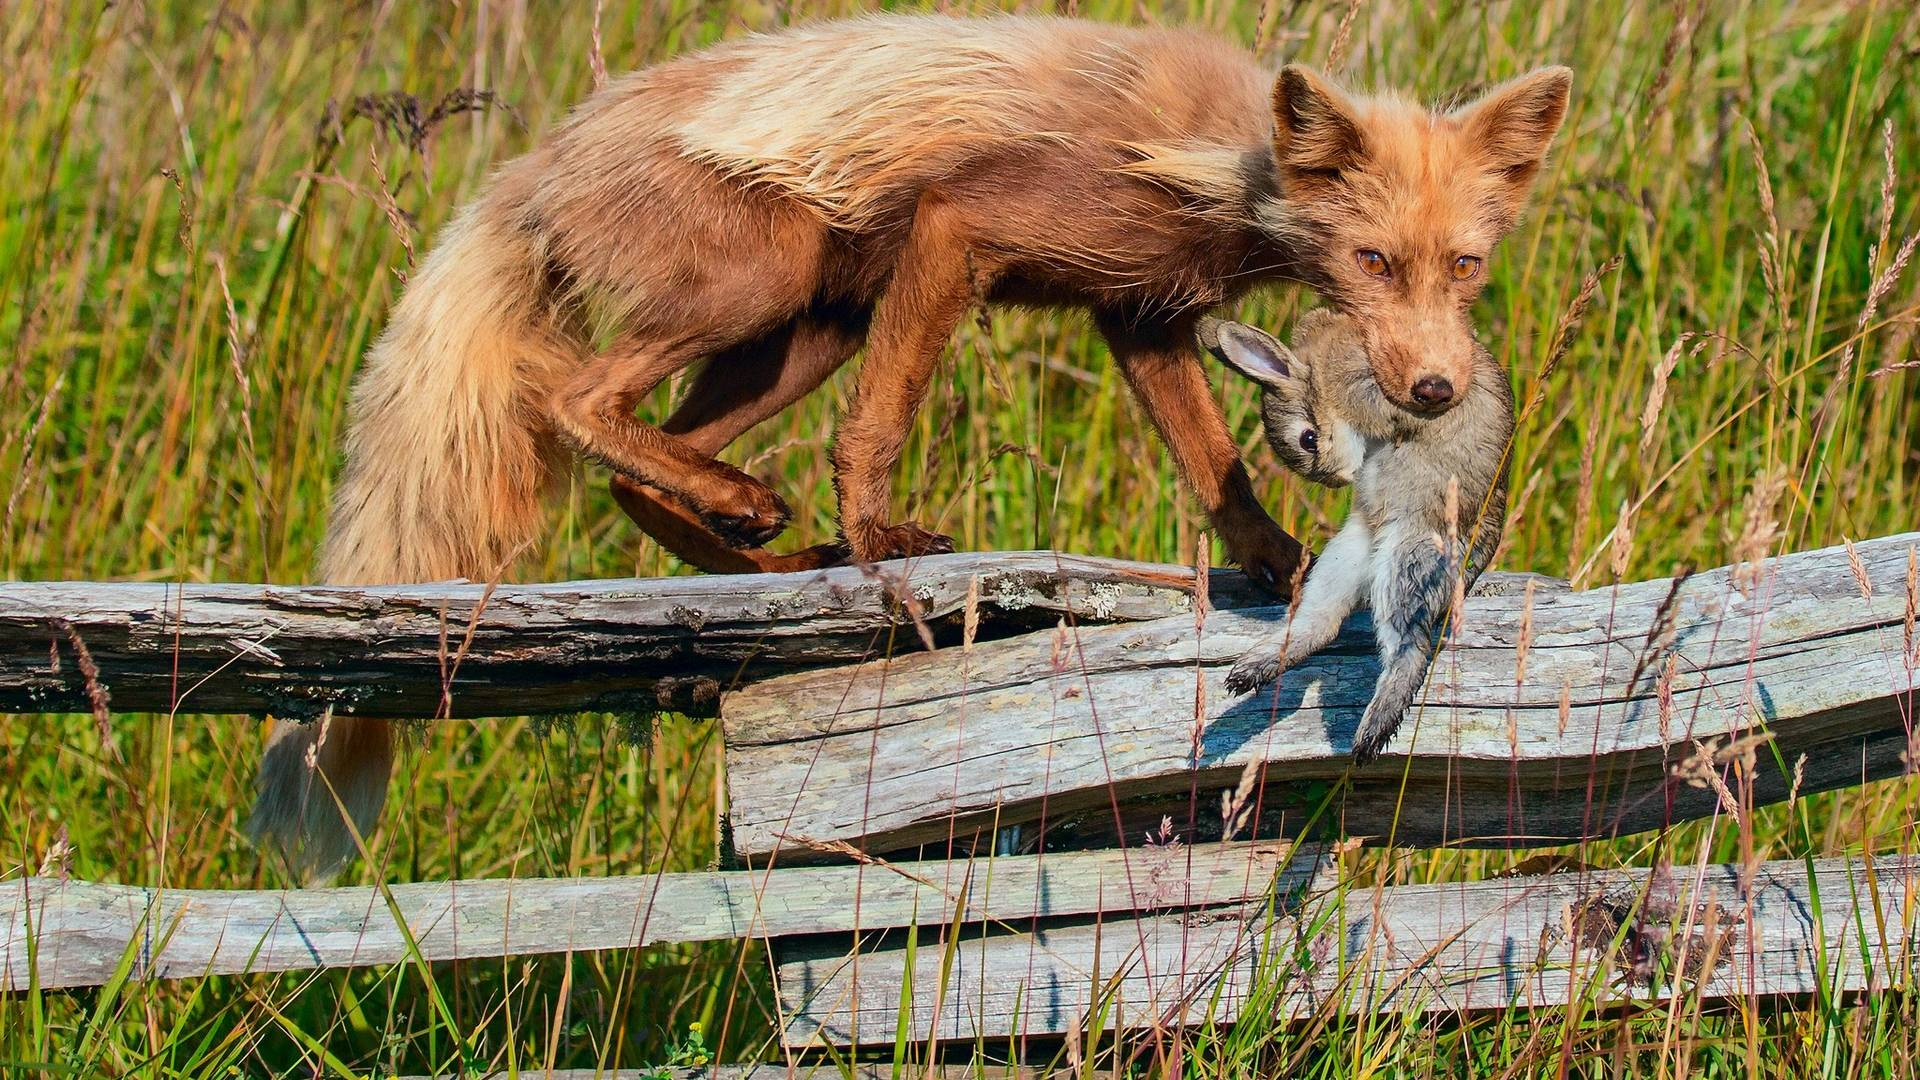 обои кайот, добыча, кролик картинки фото